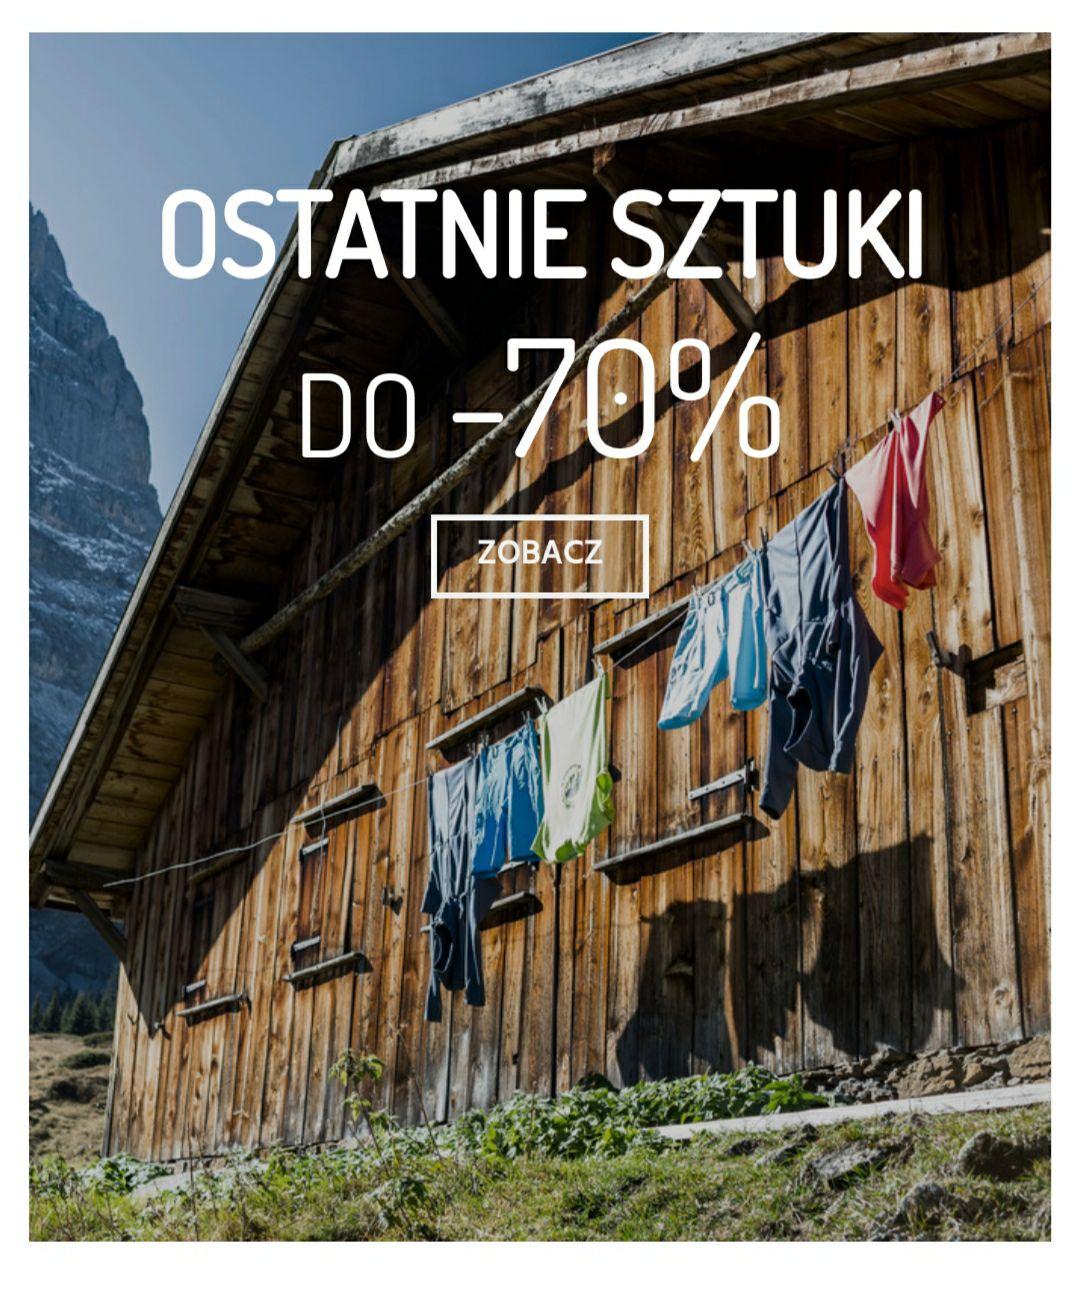 MAMMUT OSTATNIE SZTUKI DO -70%